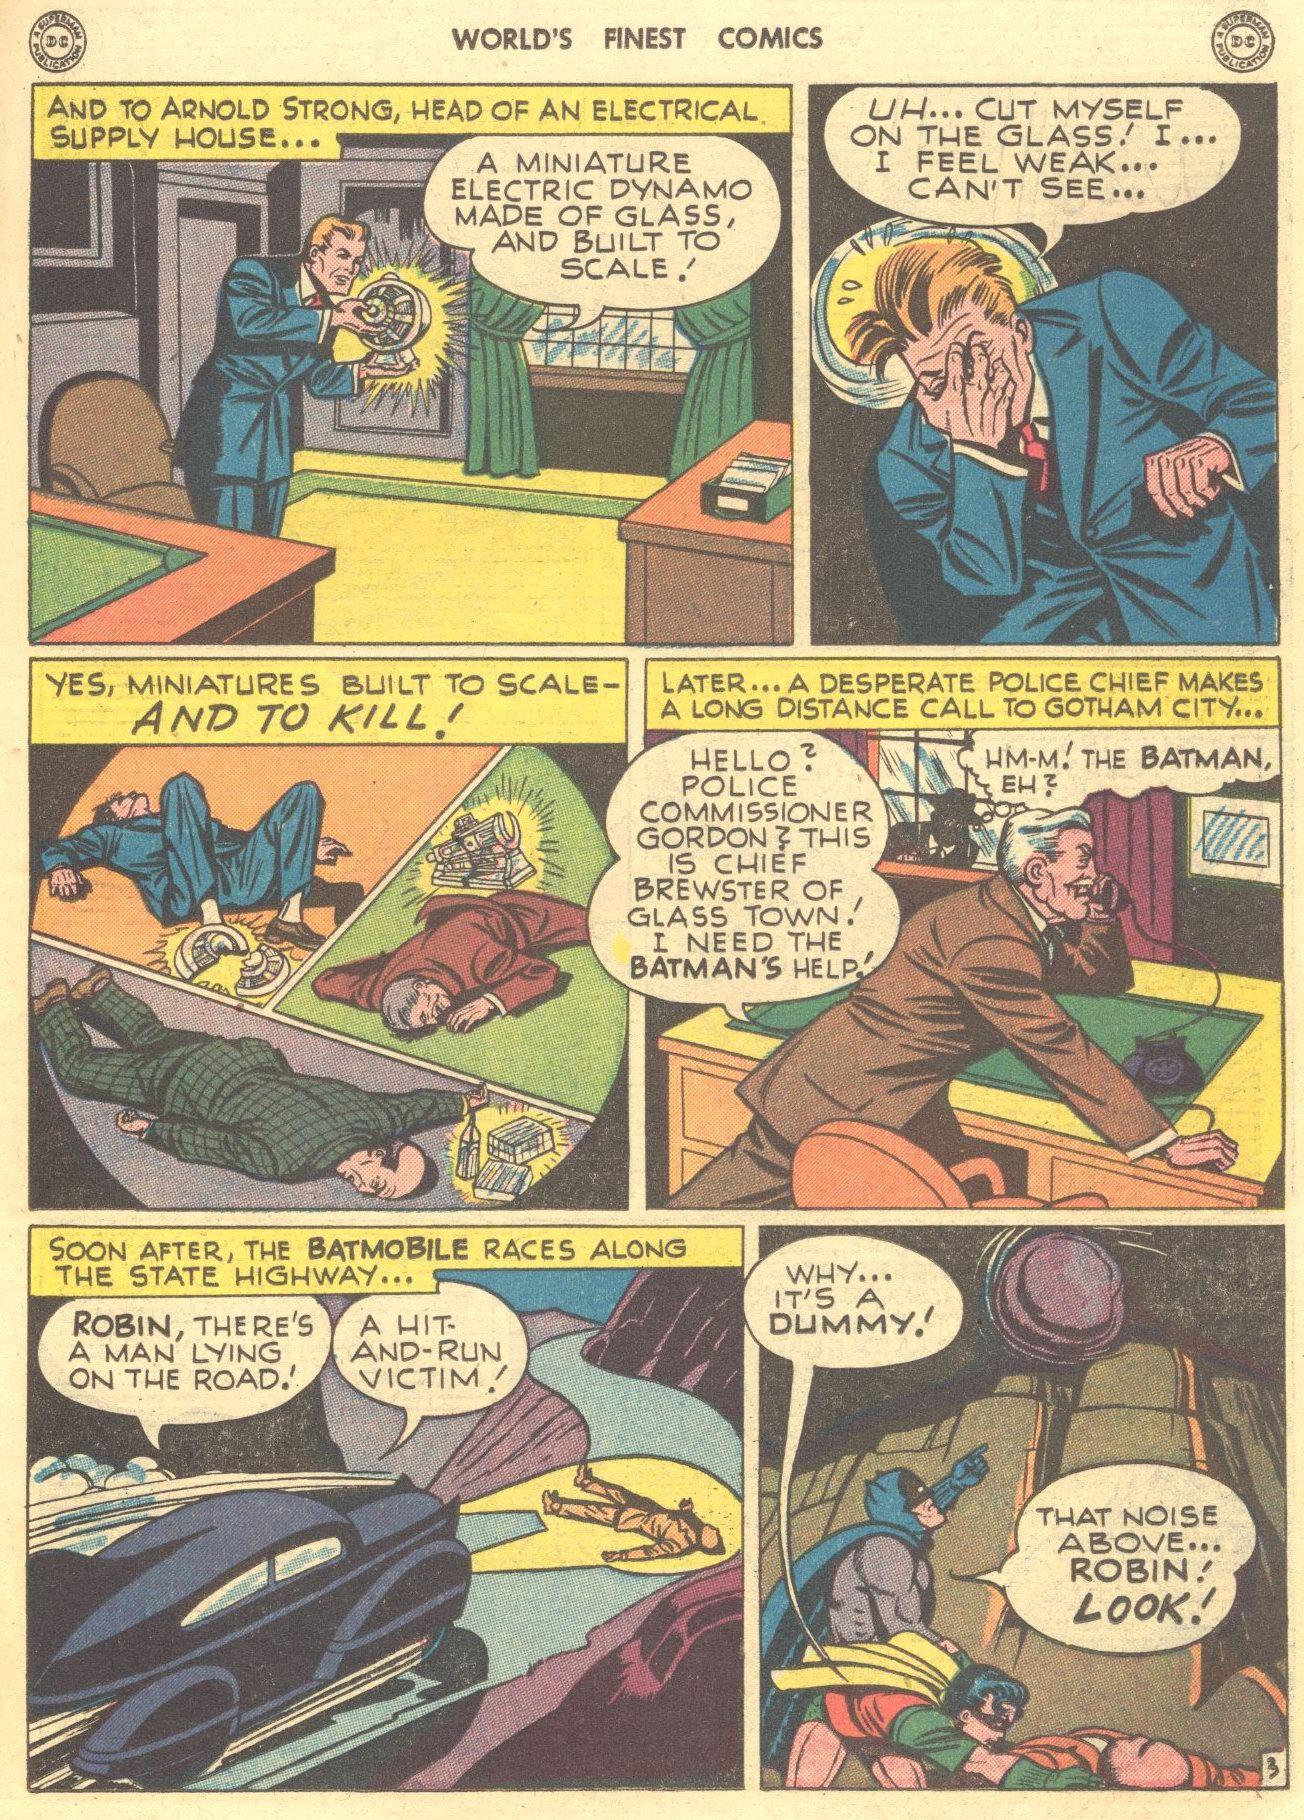 Read online World's Finest Comics comic -  Issue #28 - 62